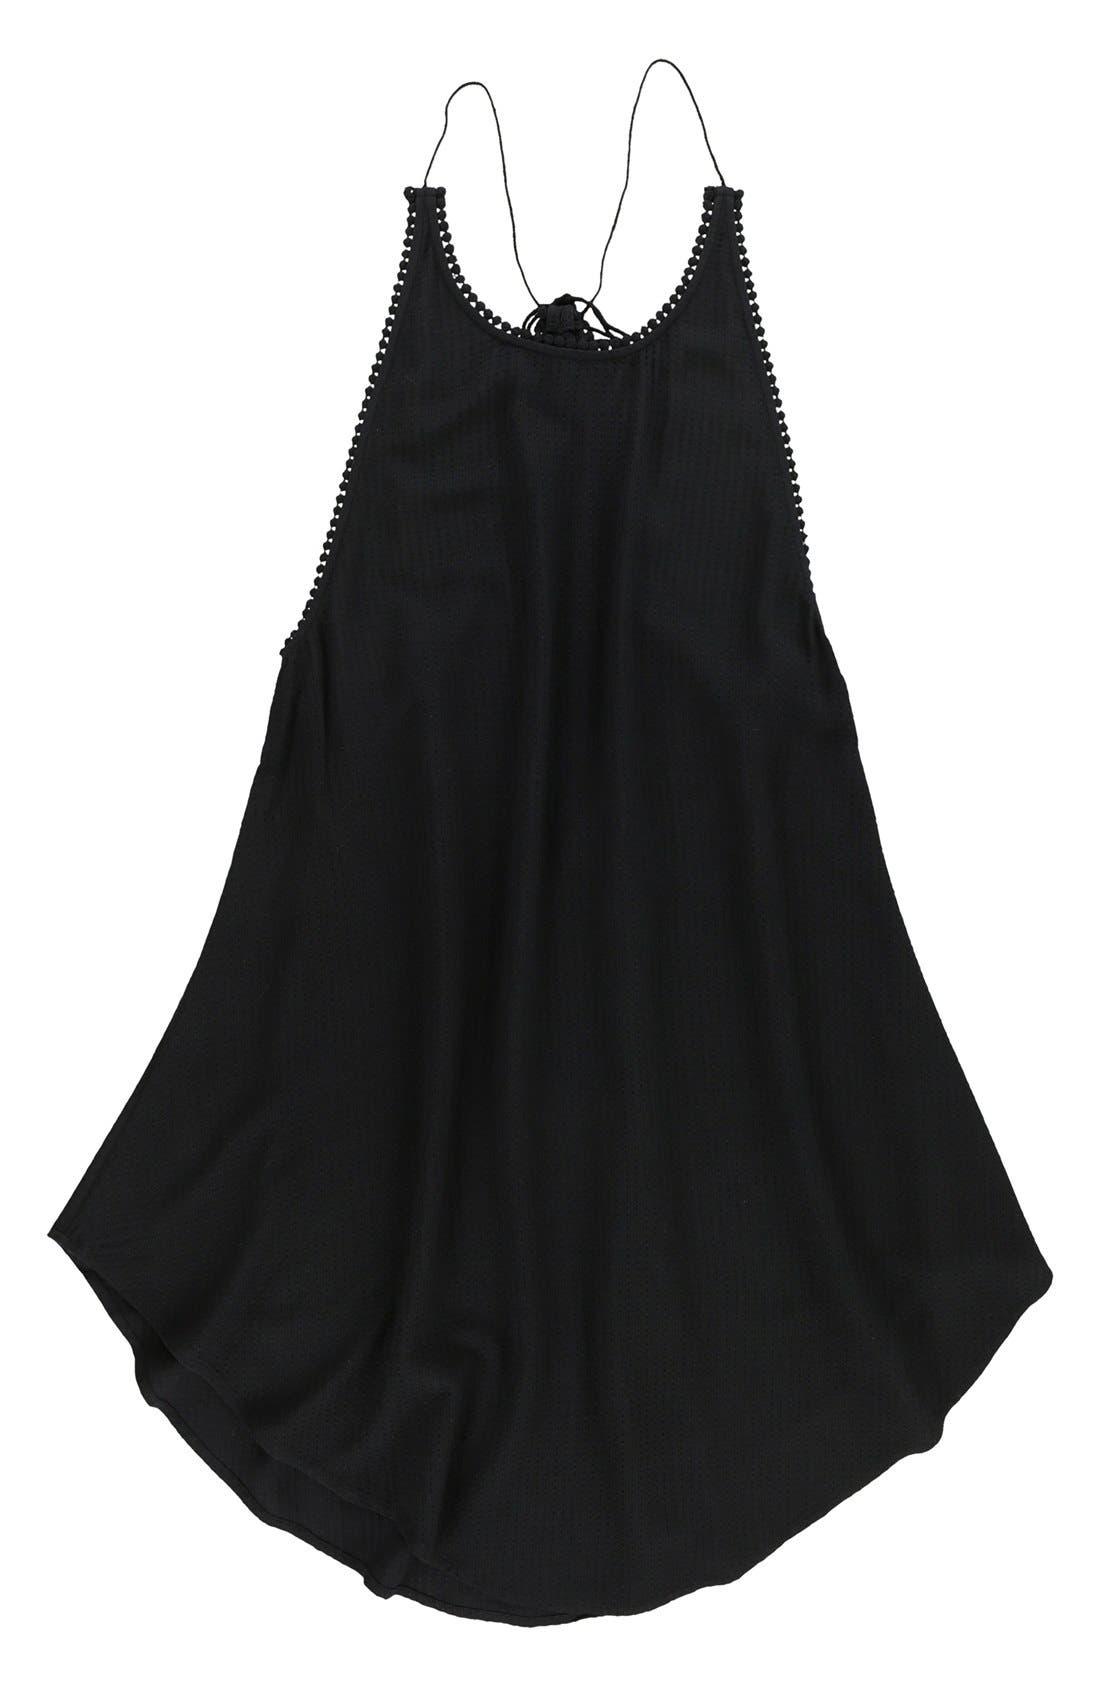 O'NEILL, Cover-Up Dress, Main thumbnail 1, color, 001